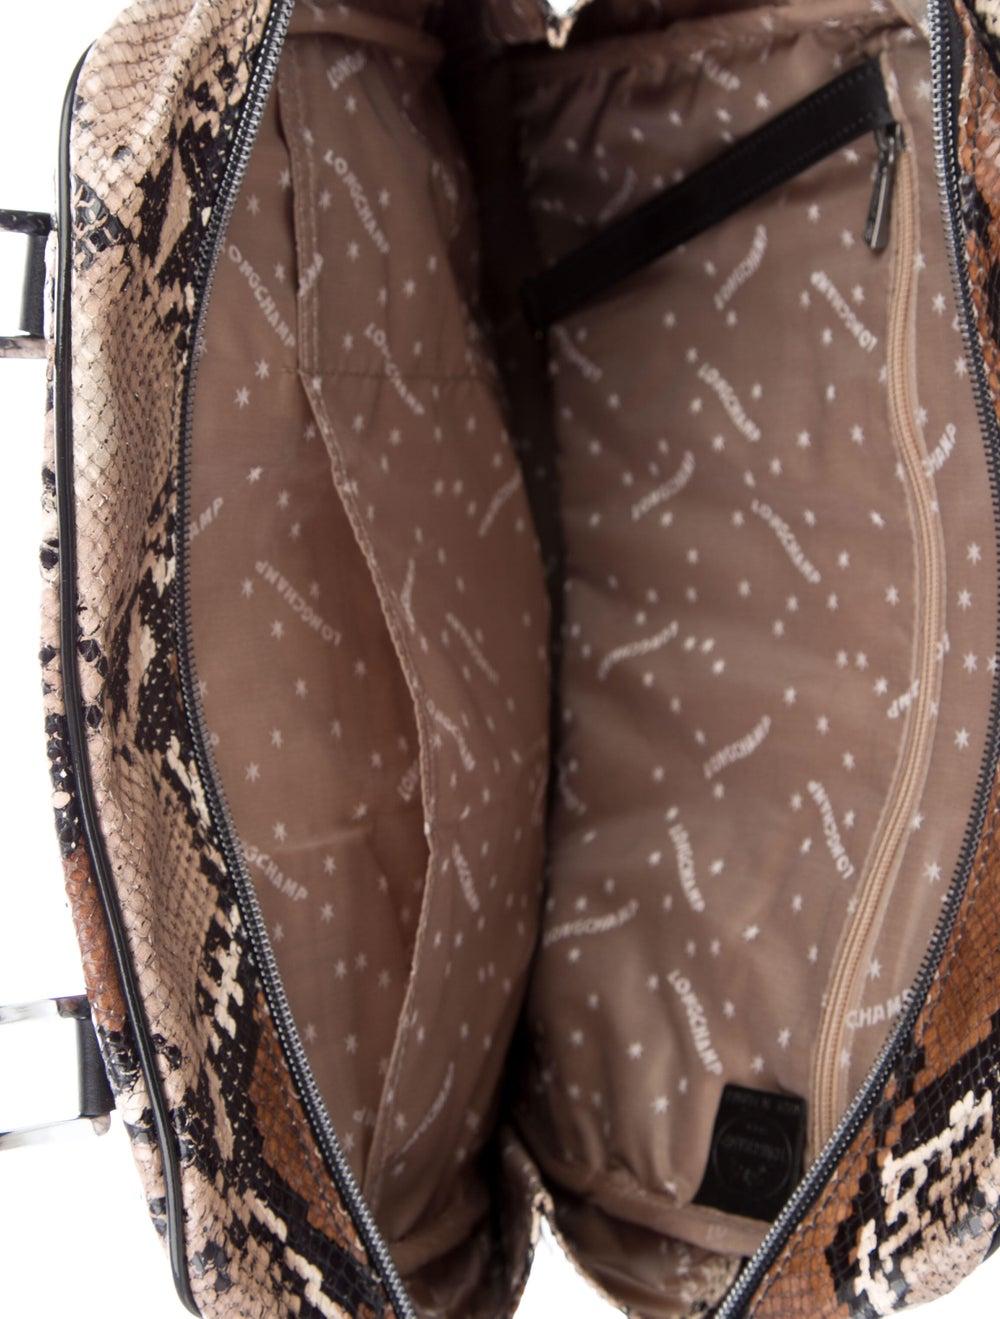 Longchamp Python Leather Tote Brown - image 5